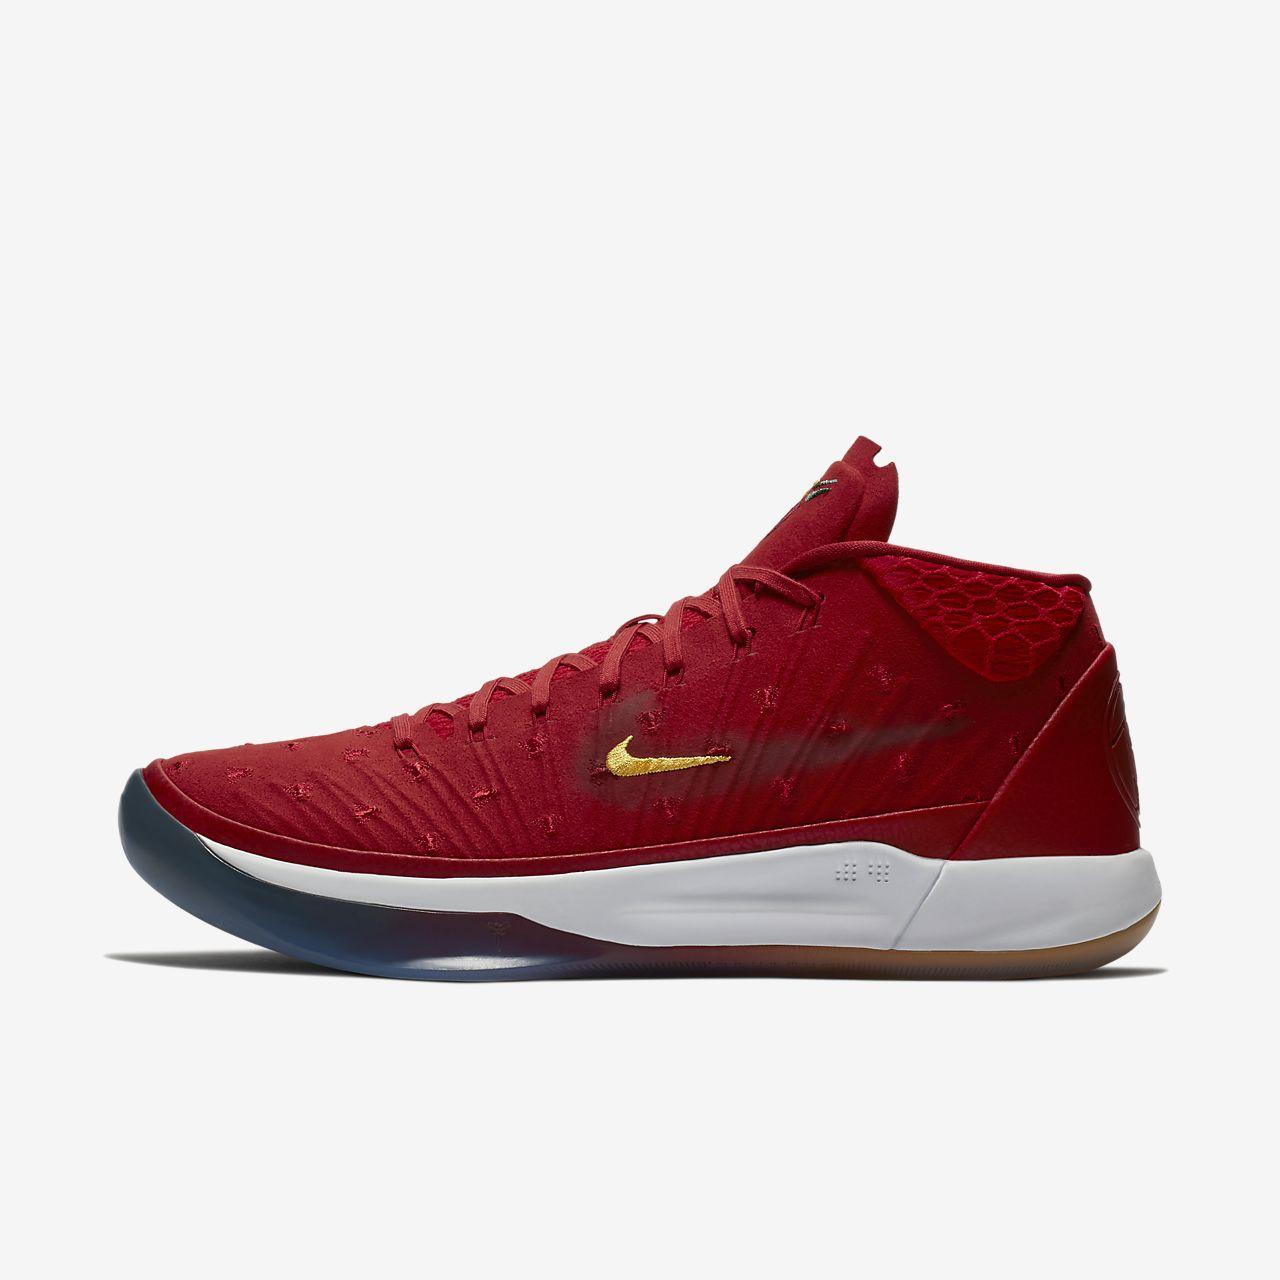 uk availability 72f38 fd26e ... wholesale nike kobe a.d. mighty it pe basketball shoe 13281 427f3